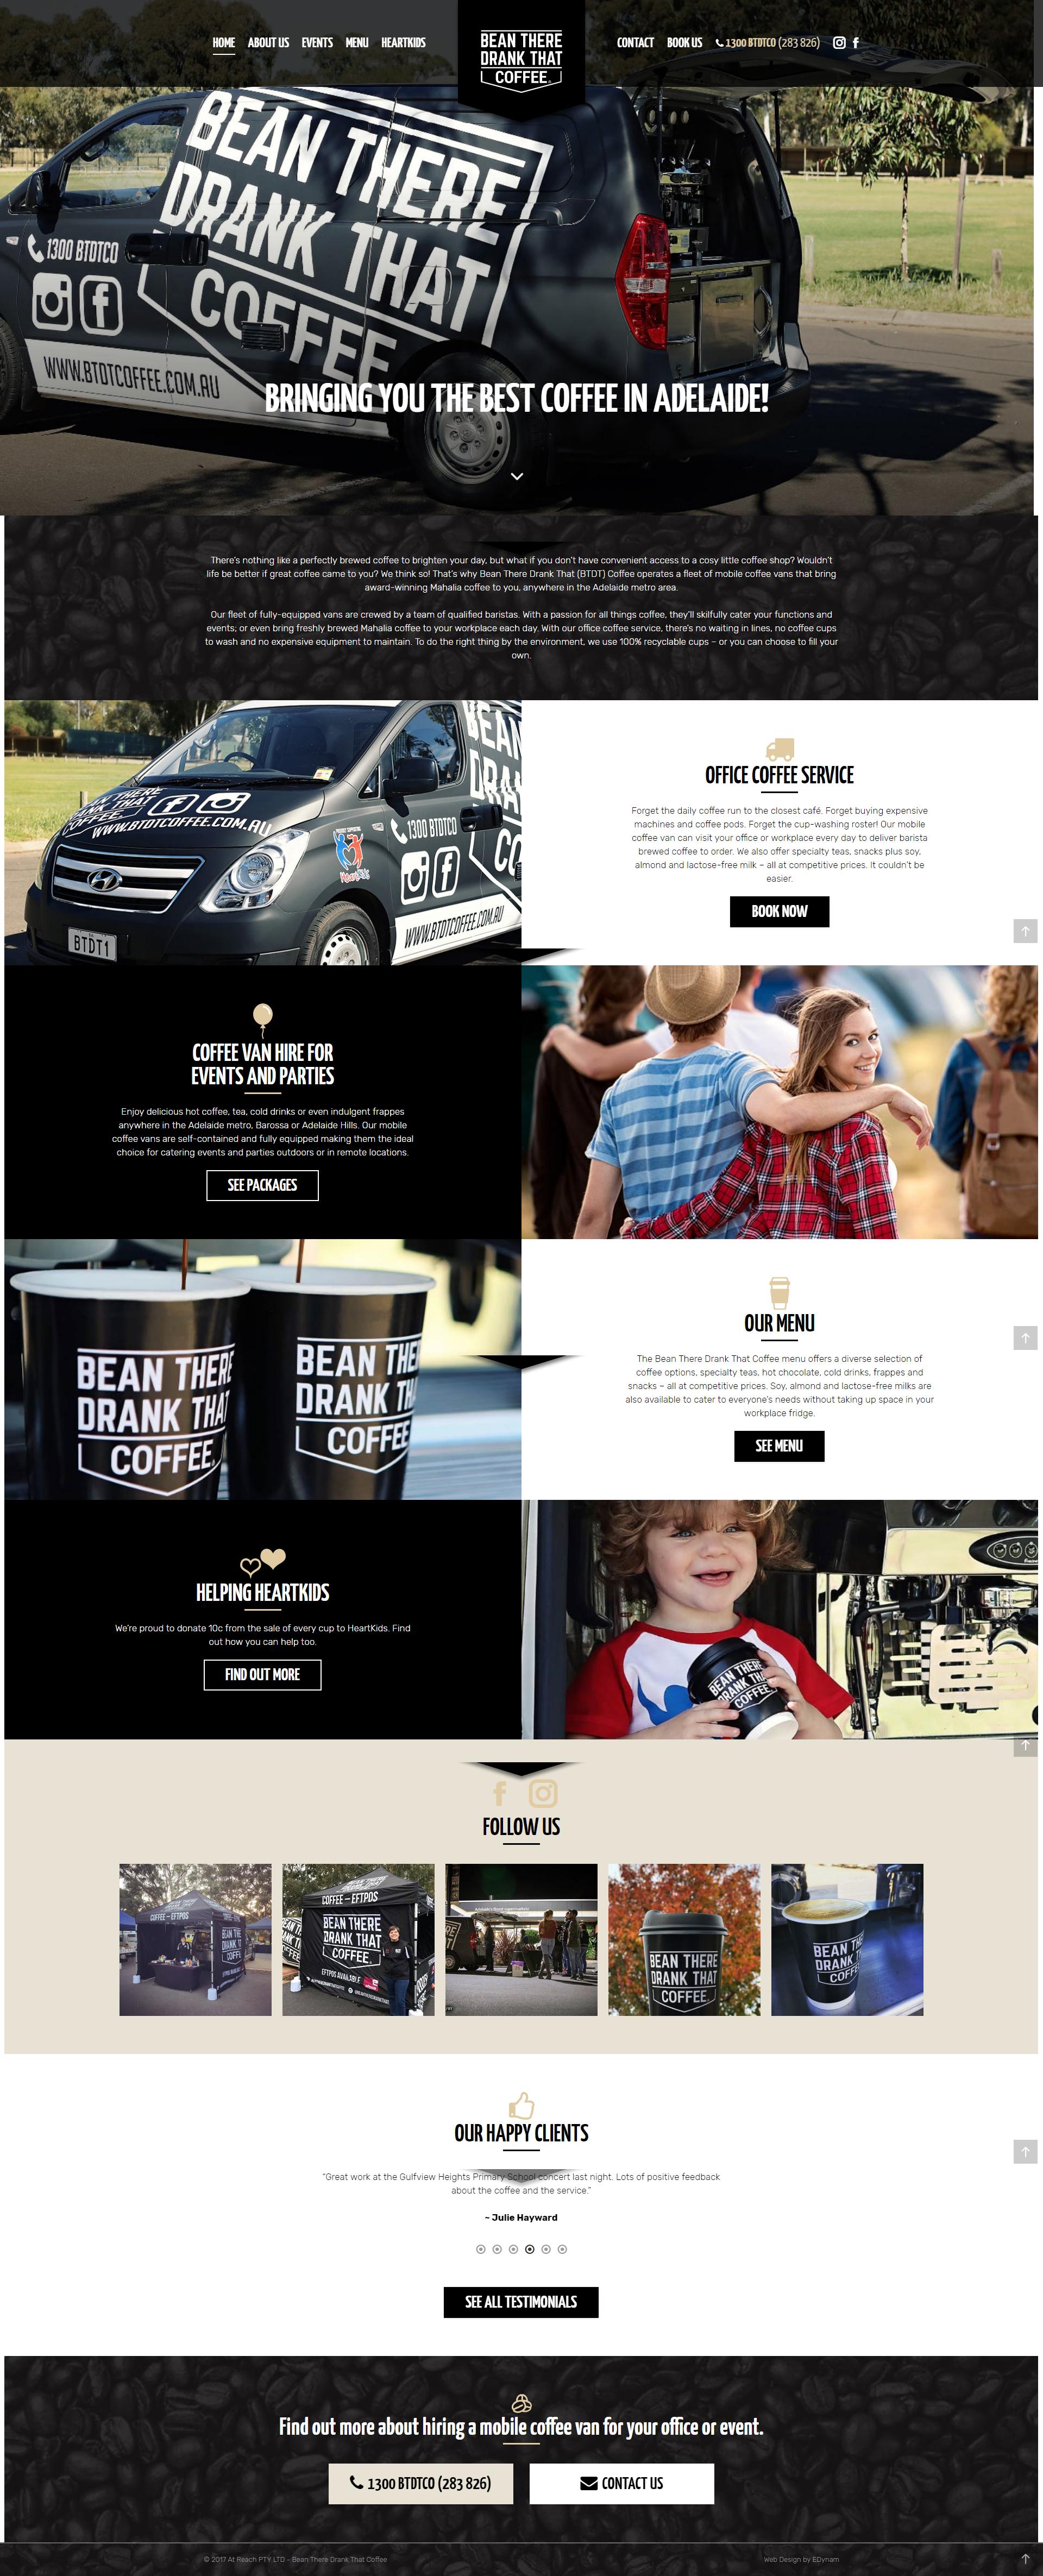 BTDT Coffee - website copywriting